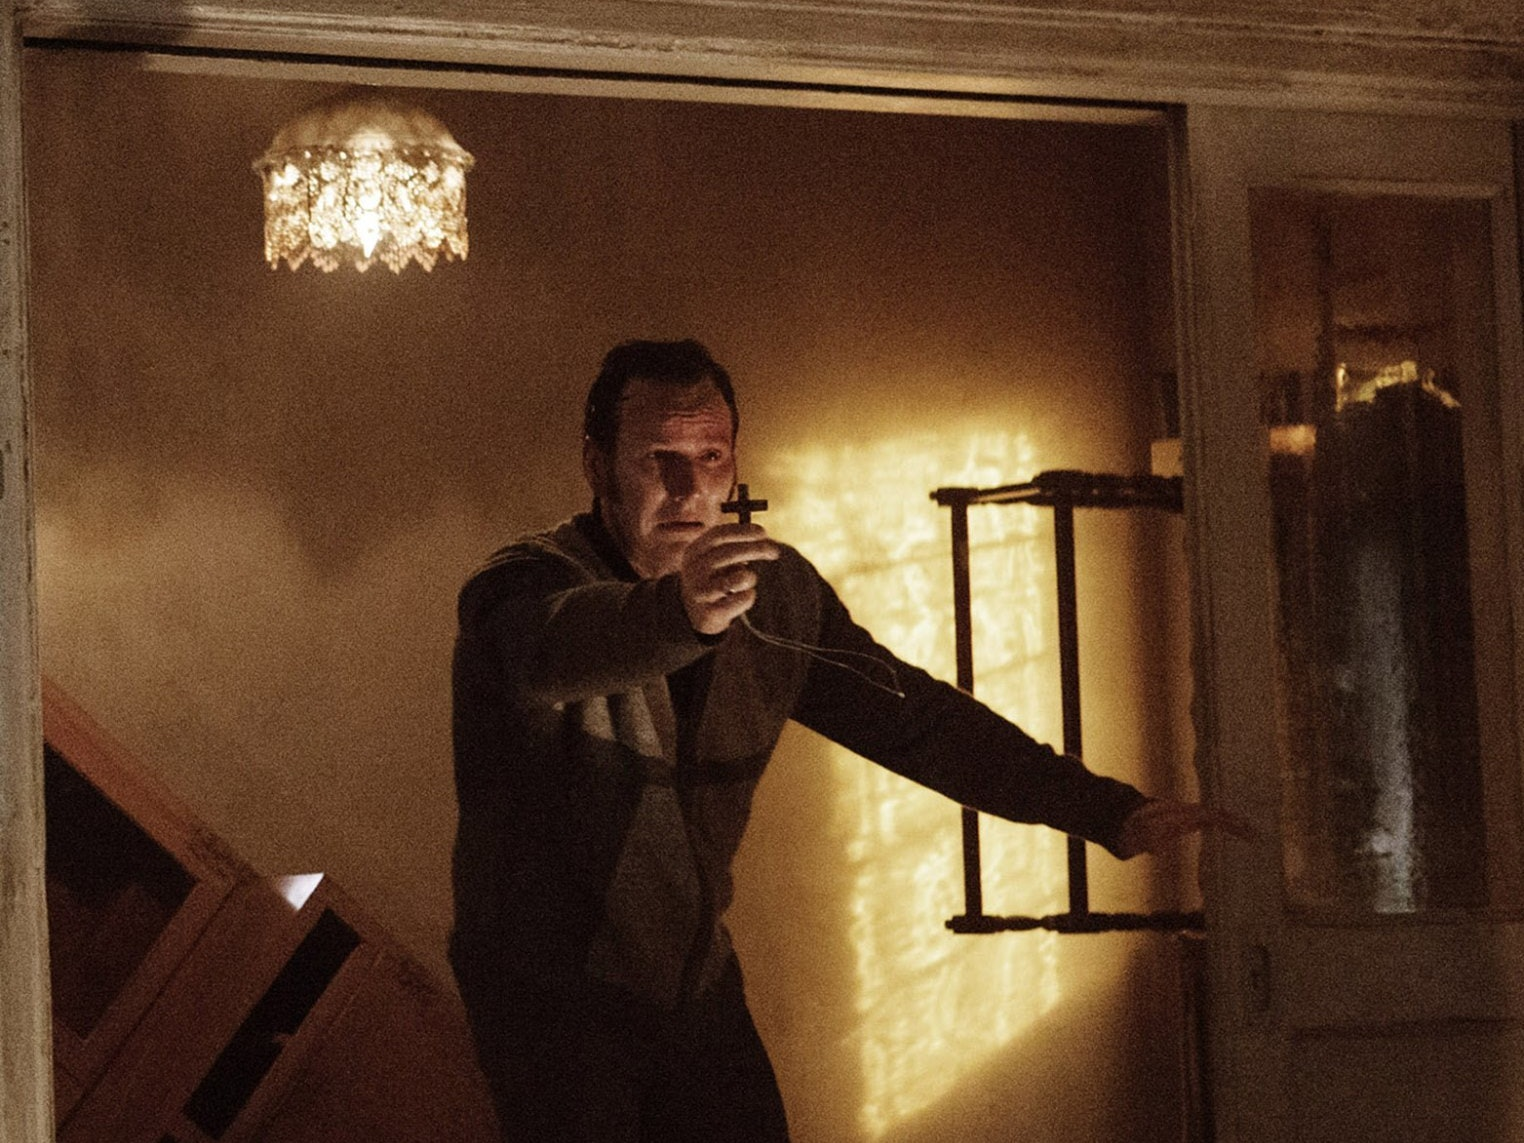 5 Horror Movie Sequels That Aren't Crappy Cash-ins